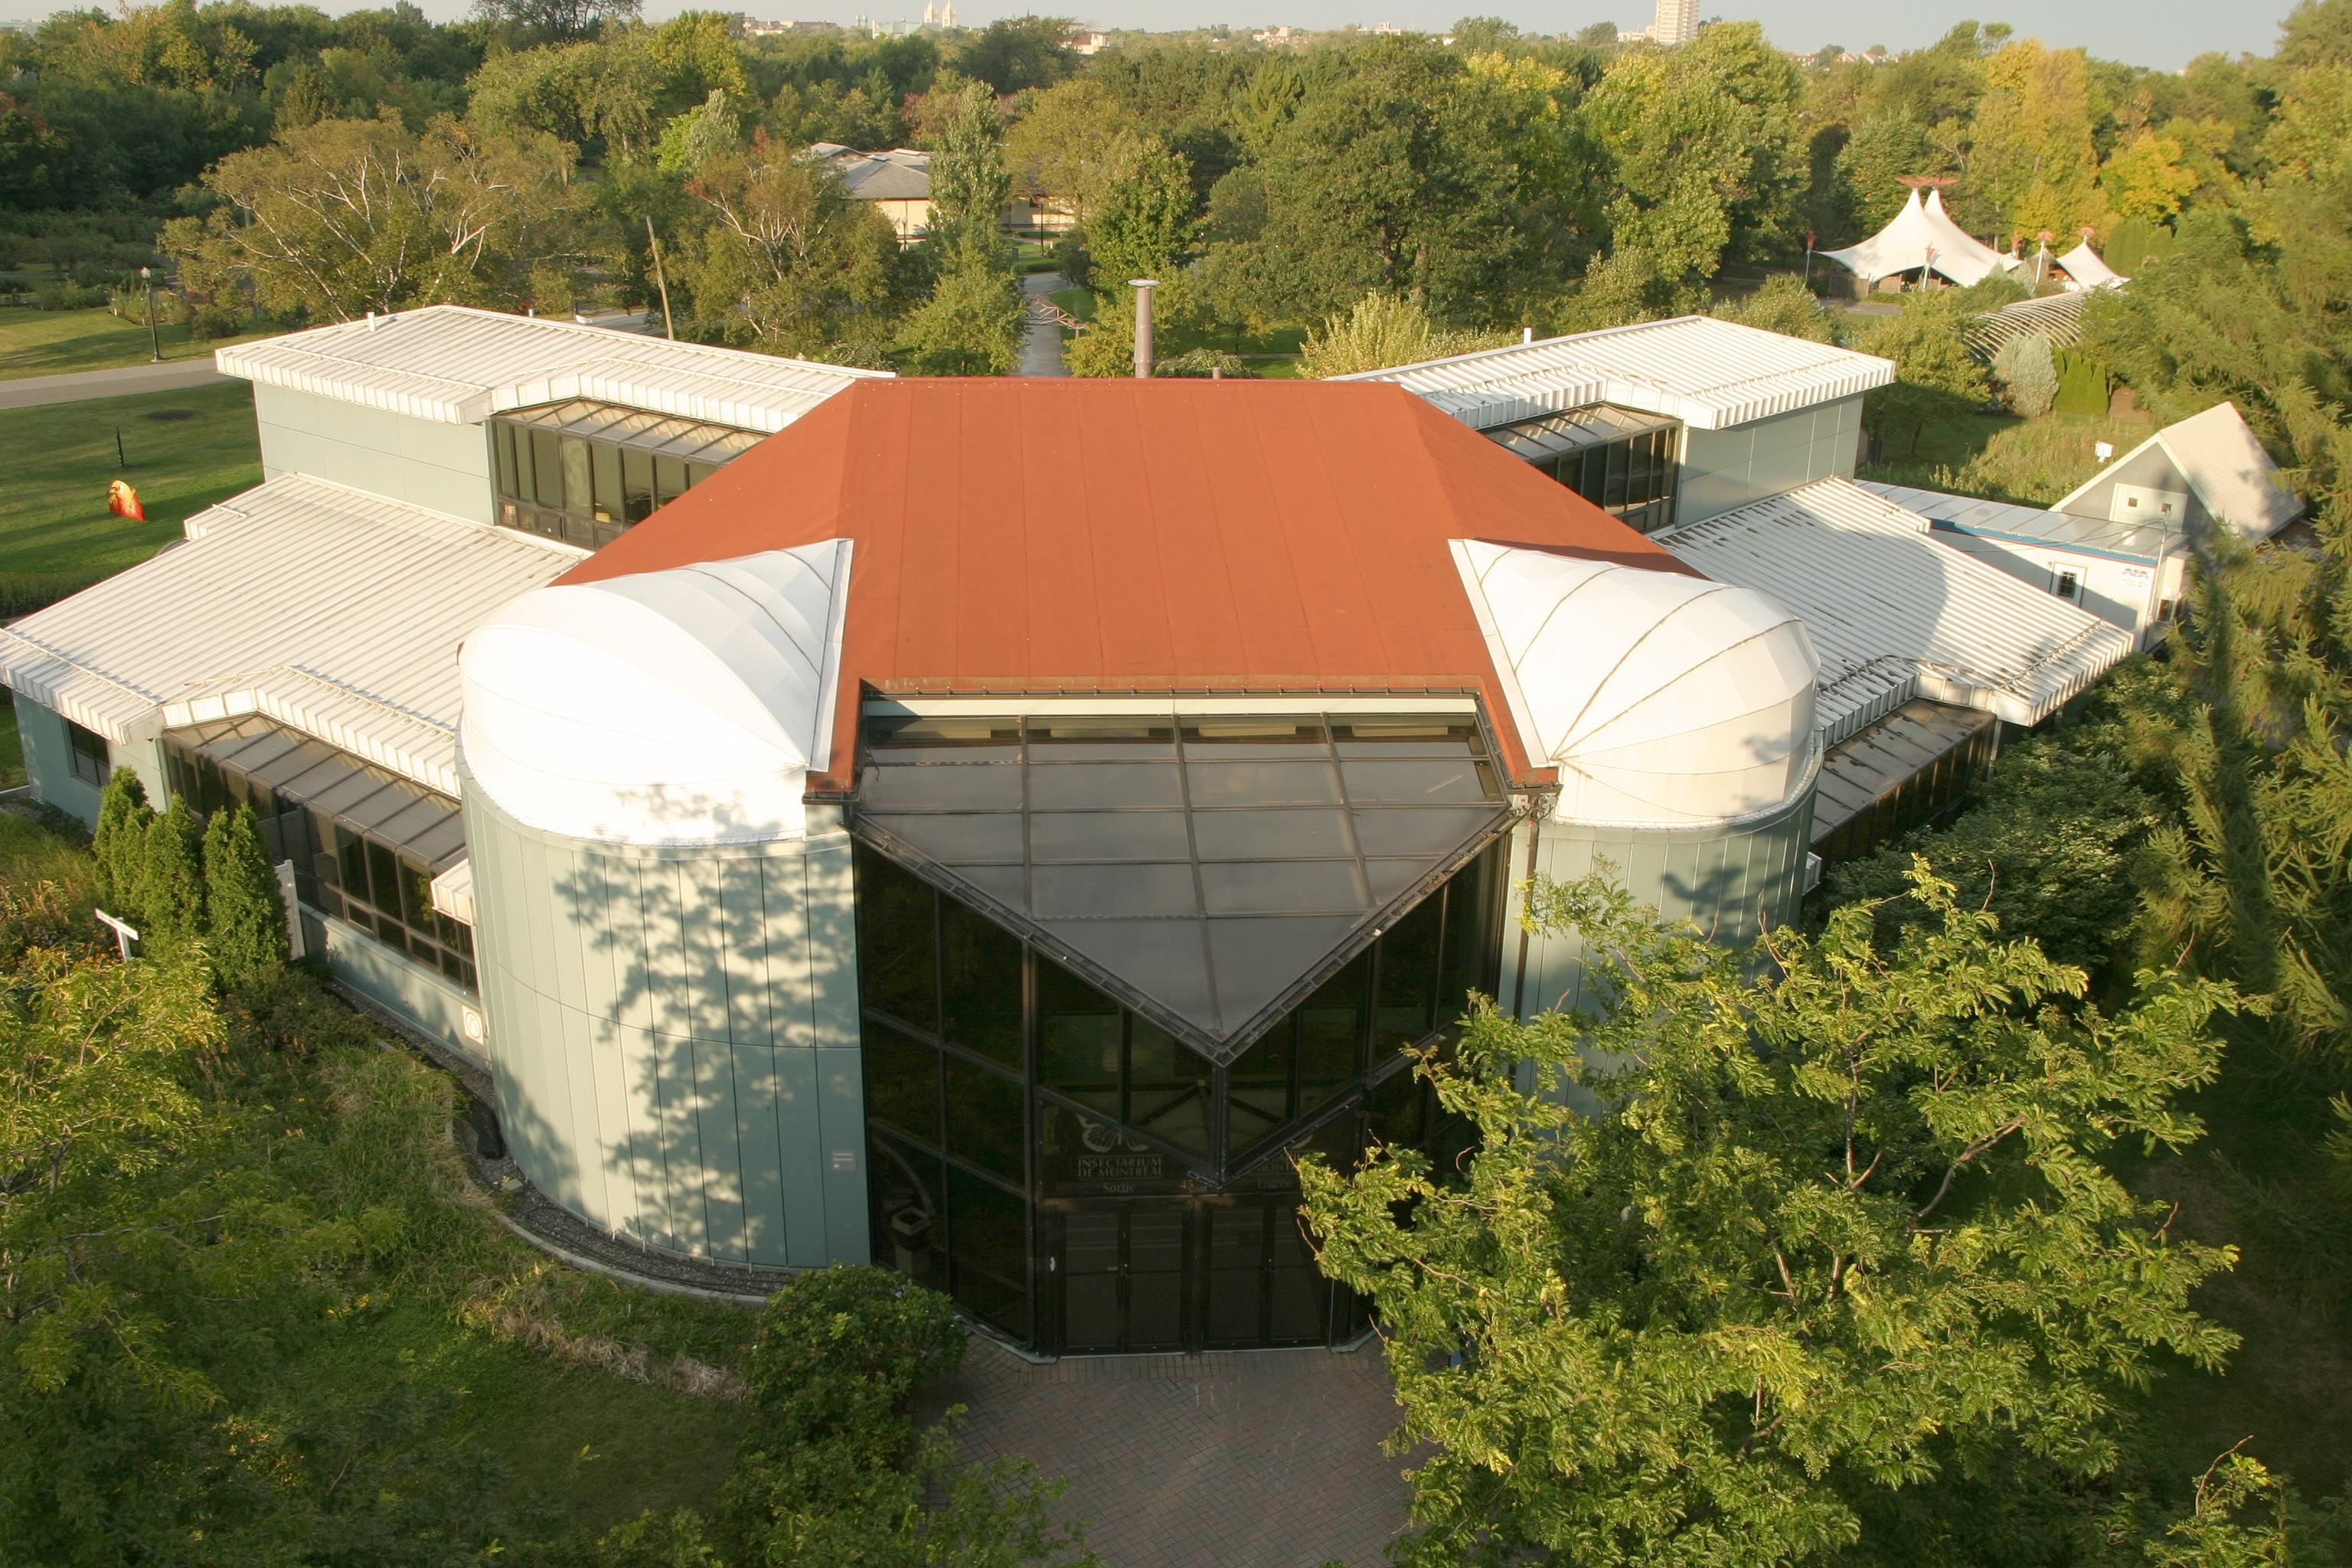 Insectarium space for life for Biodome insectarium jardin botanique